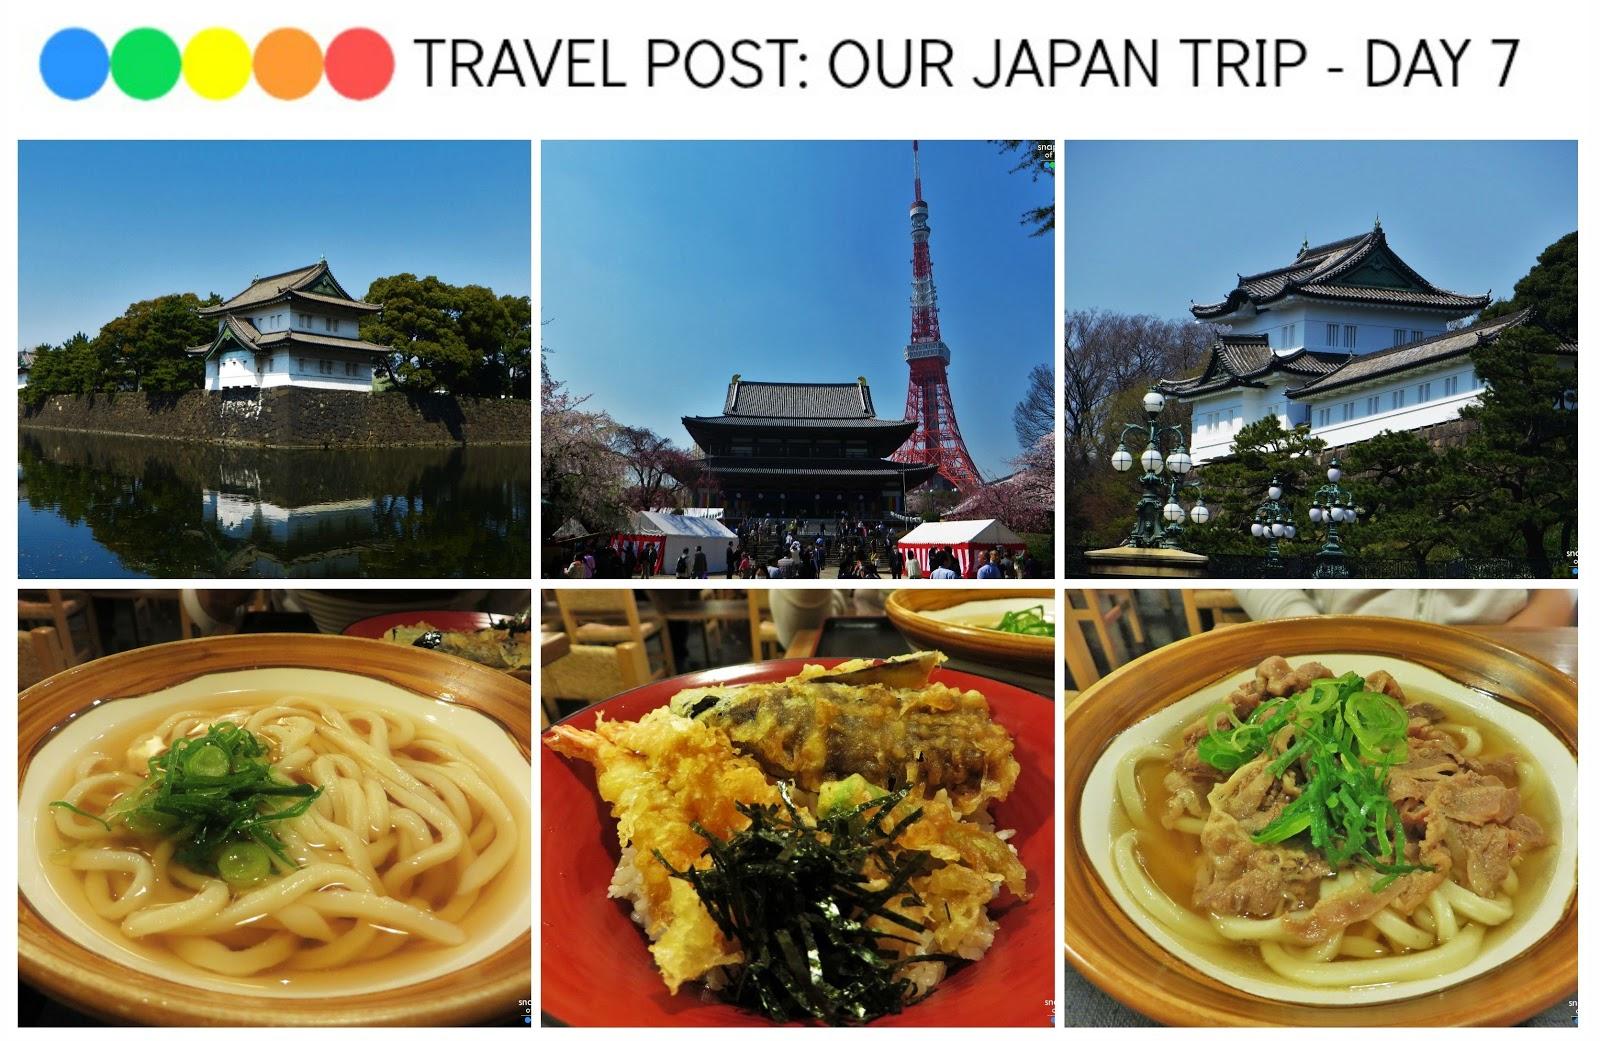 Last day in Tokyo - Imperial Palace, Wadakura Fountain park, Zojo-ji Temple, Hibiya Koen park, Udon from Akhihabara and One Piece Tokyo Tower